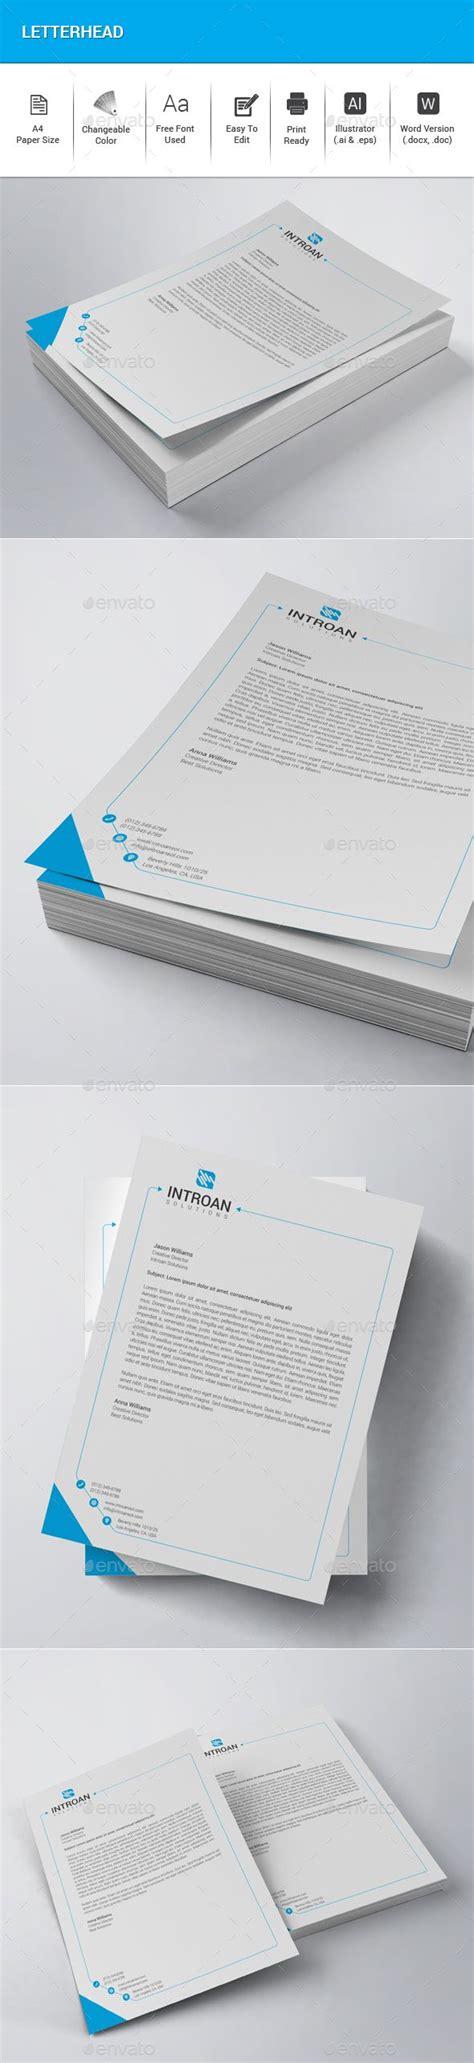 ideas  letterhead design  pinterest